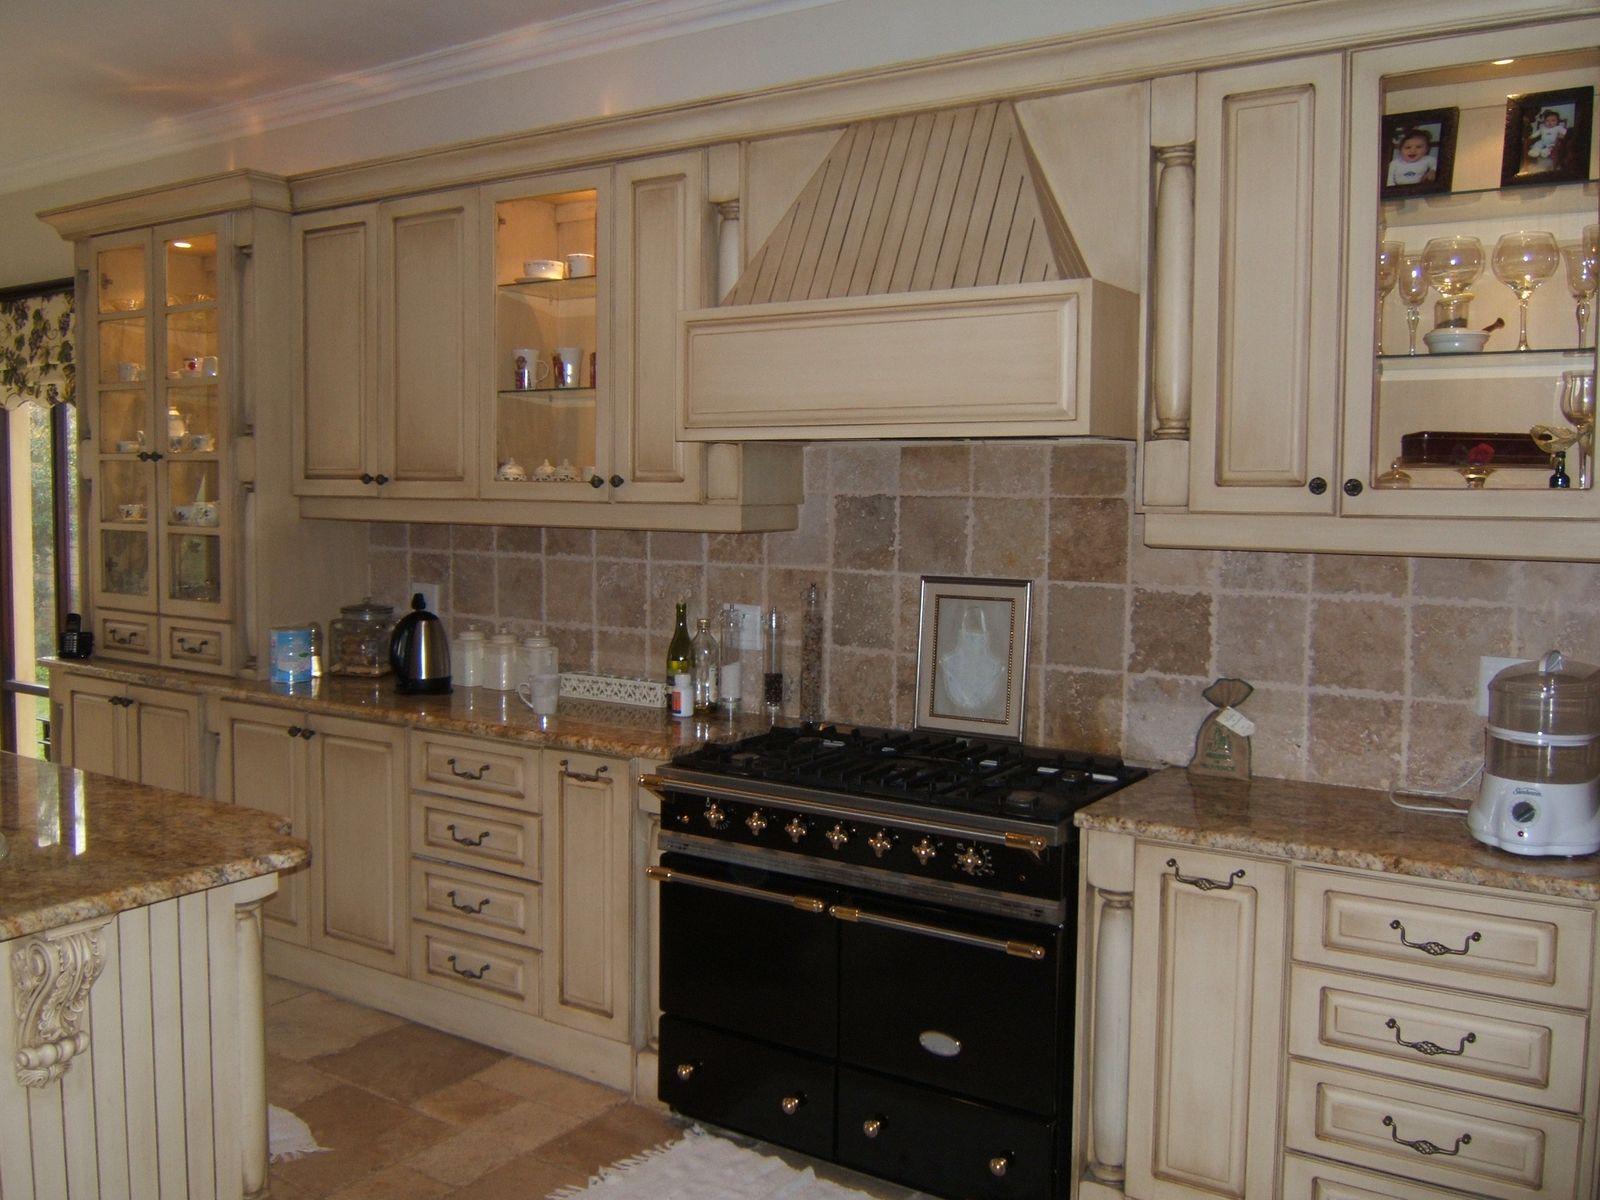 french country kitchen backsplash ideas photo - 1